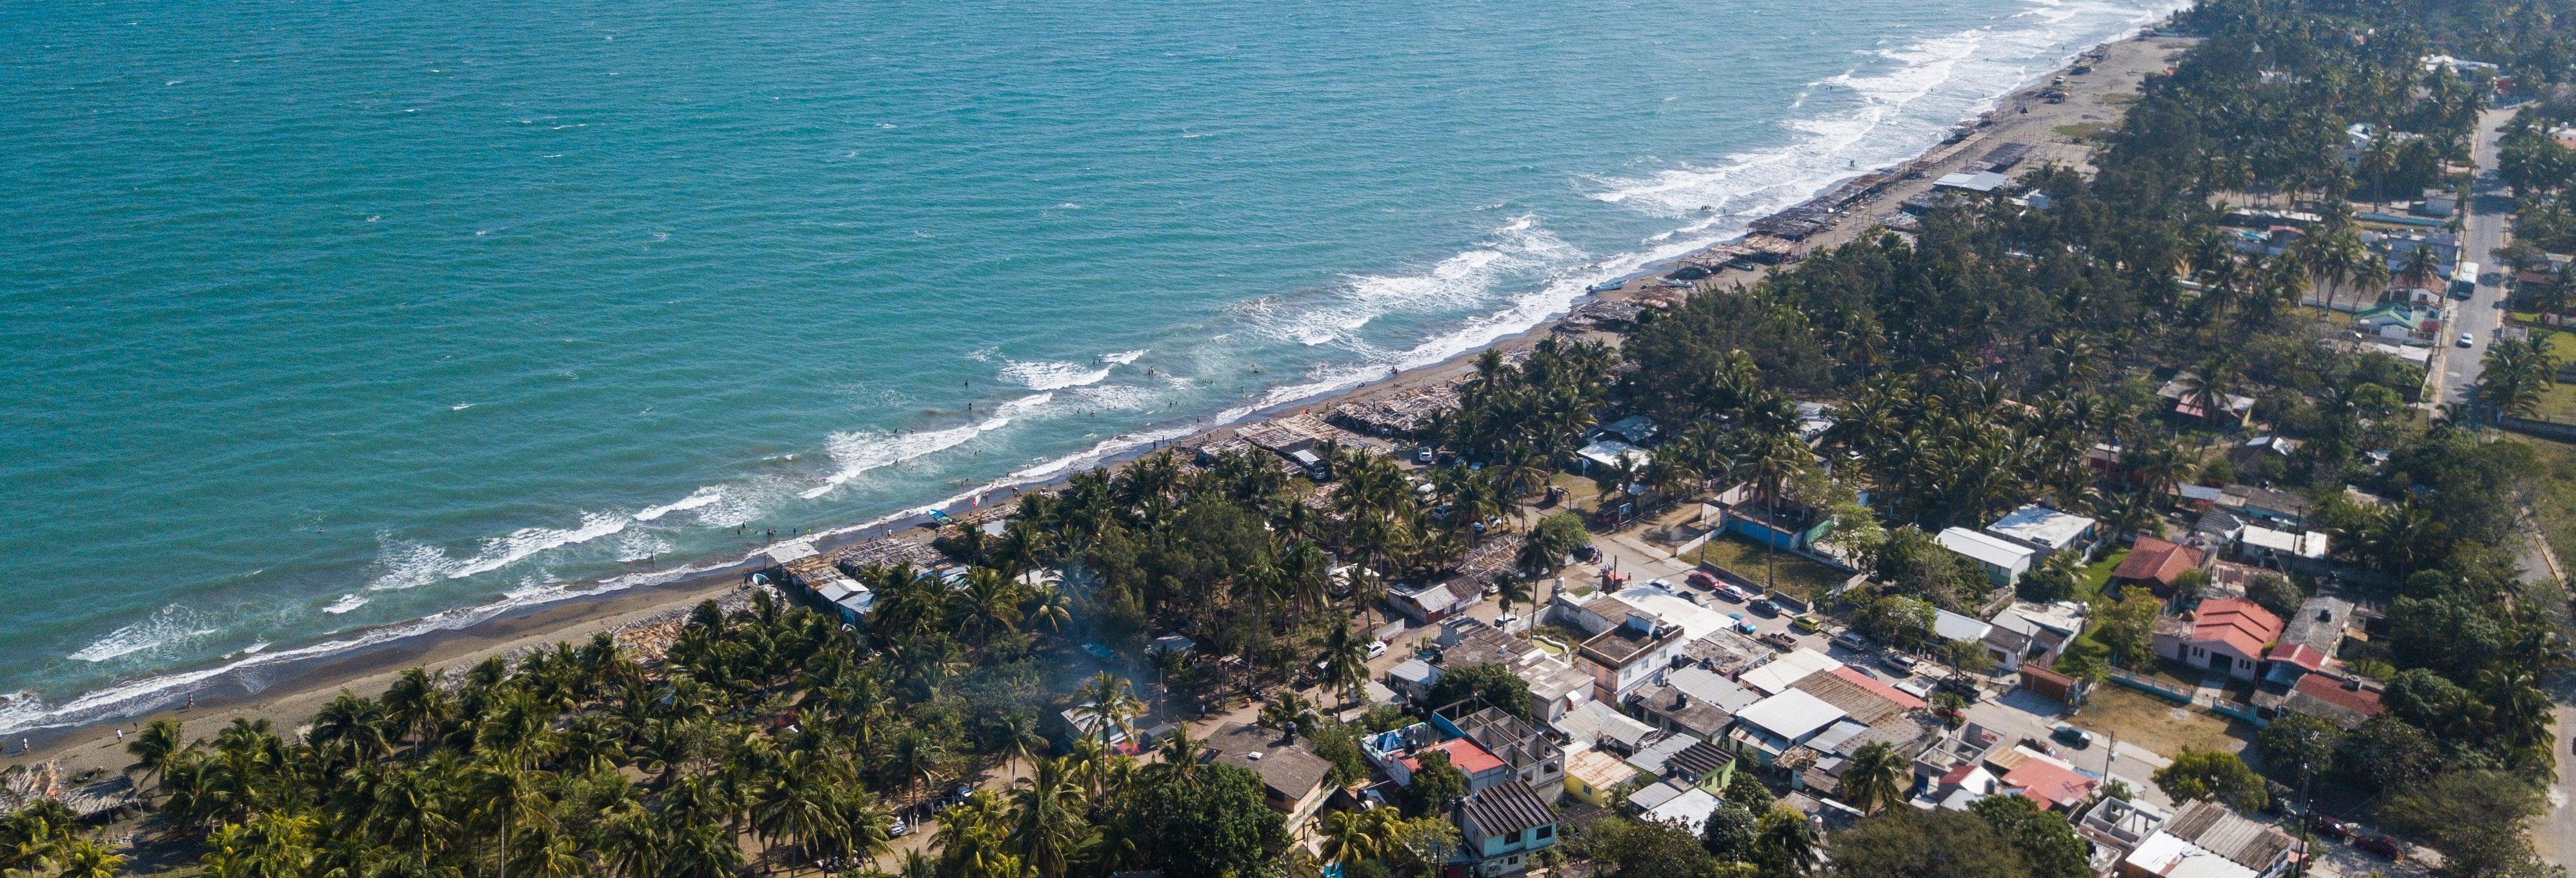 Excursão a La Antigua + Passeio de lancha